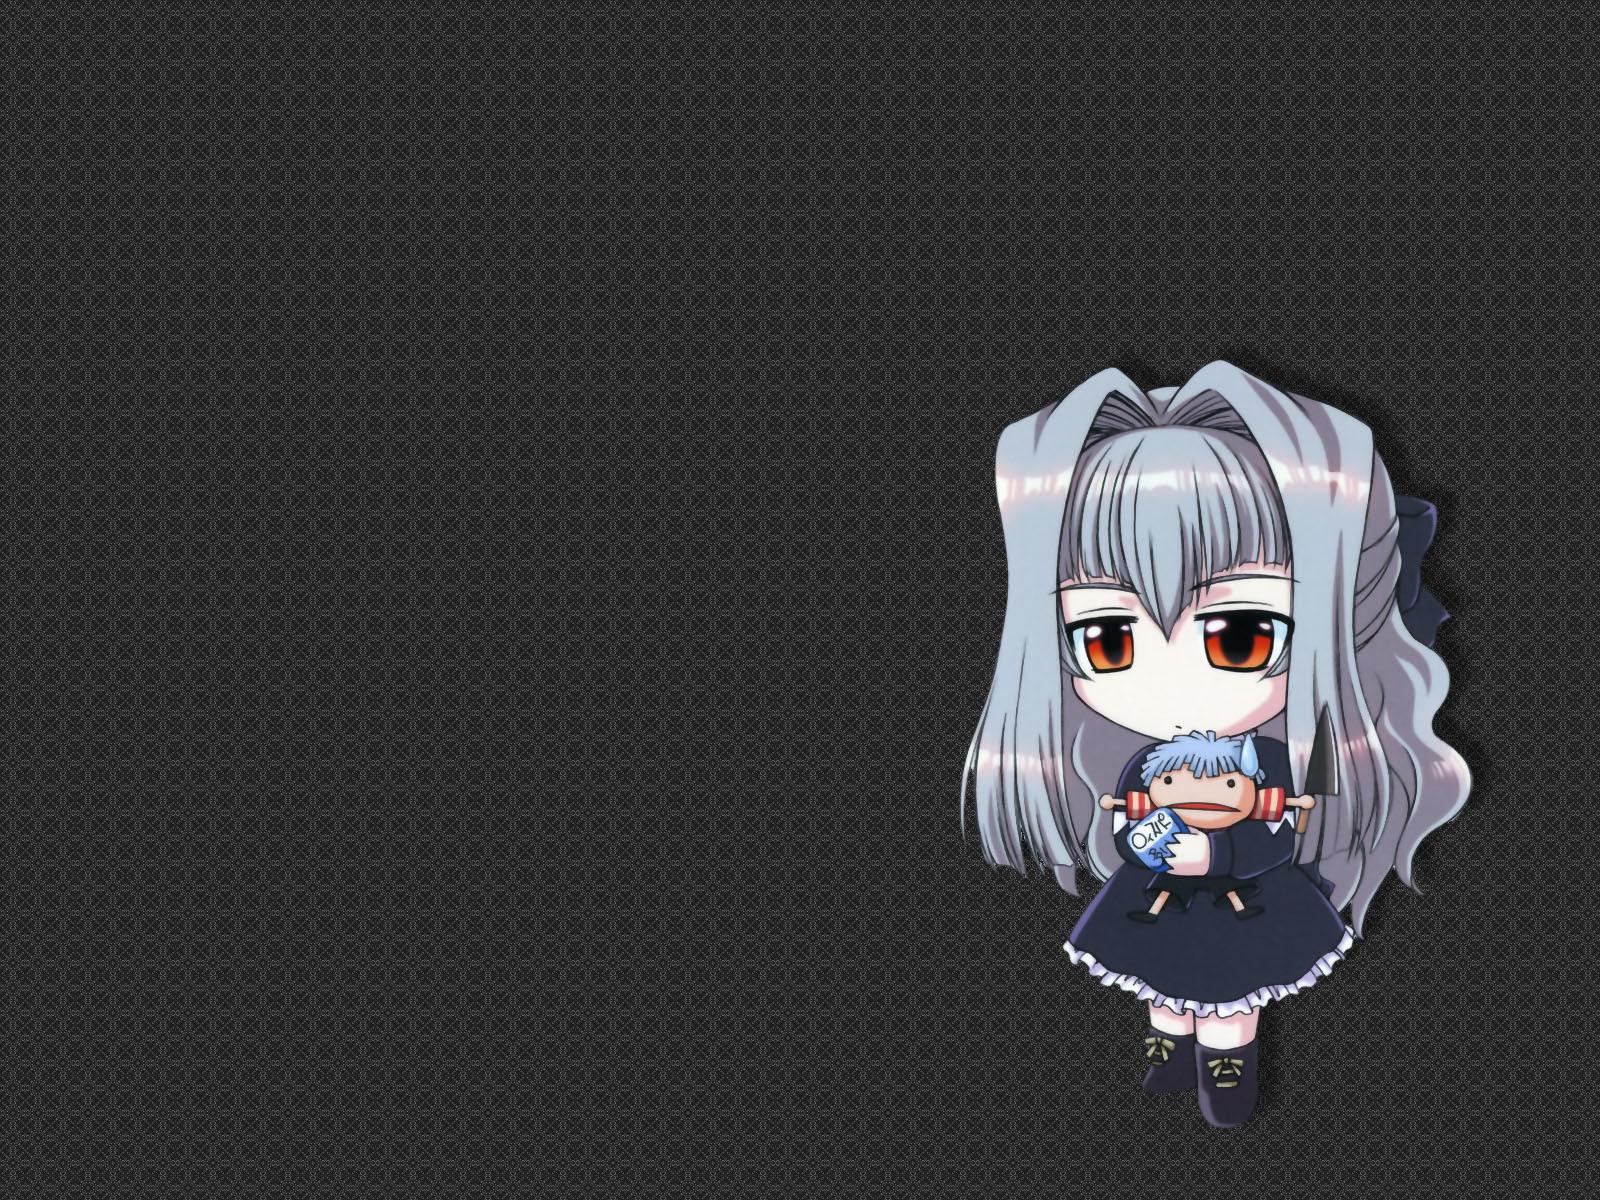 Cute Pic Girl Wallpaper Chibi Wallpaper For Desktop Pixelstalk Net